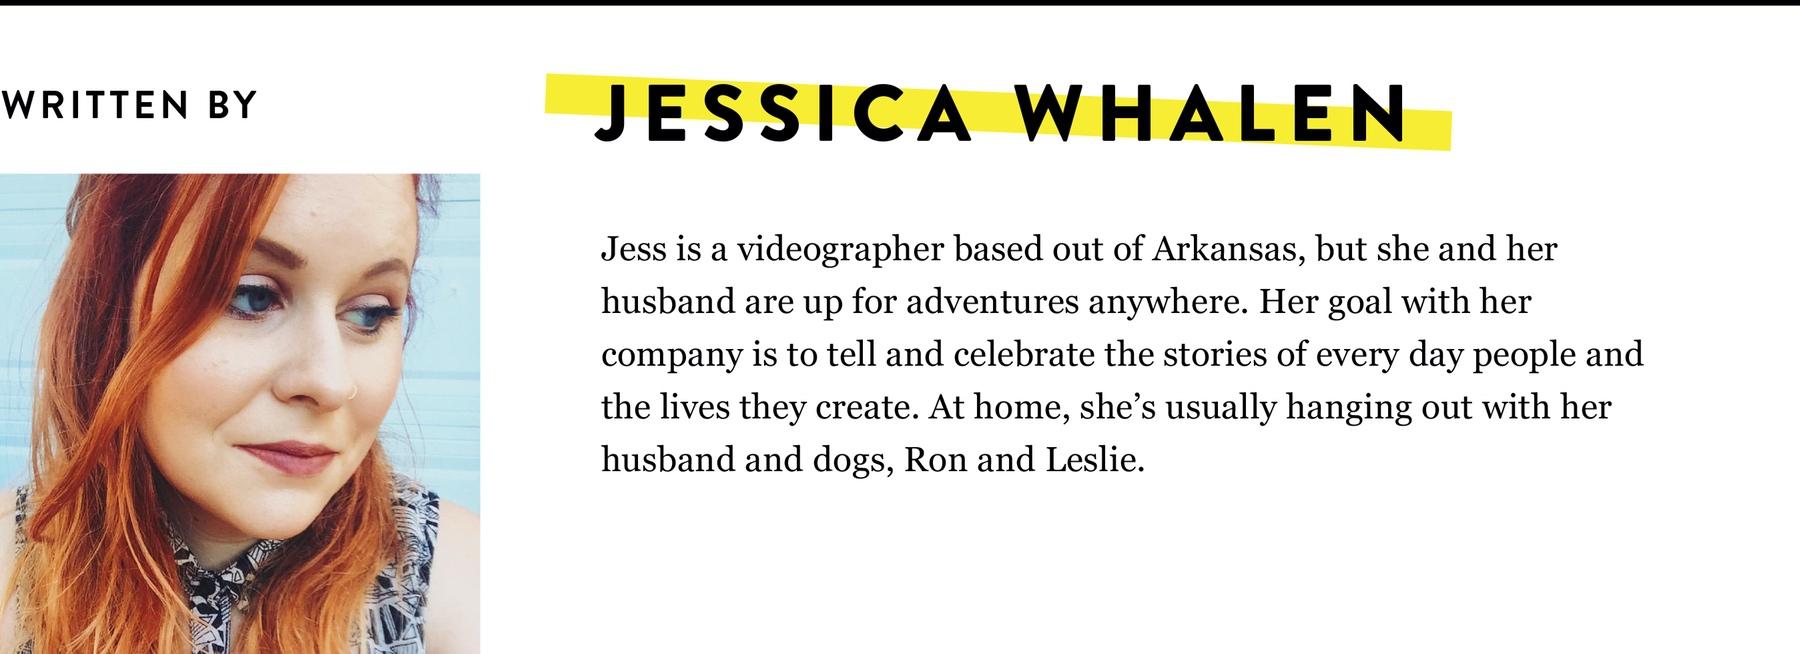 JESSICA WHALEN BIO